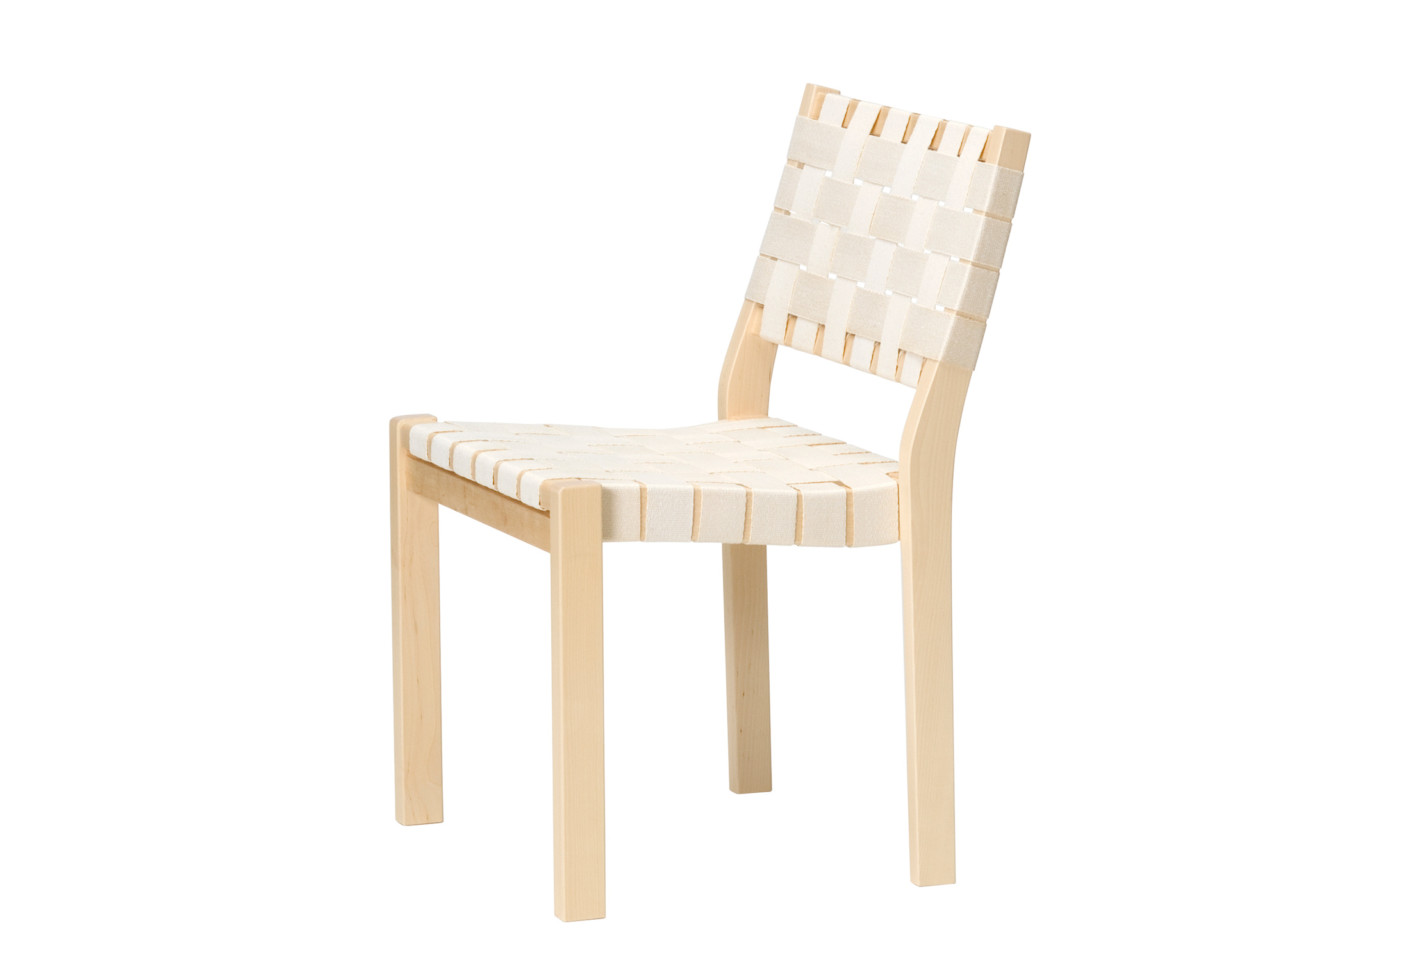 Artek Dress The Chair : Chair von artek stylepark